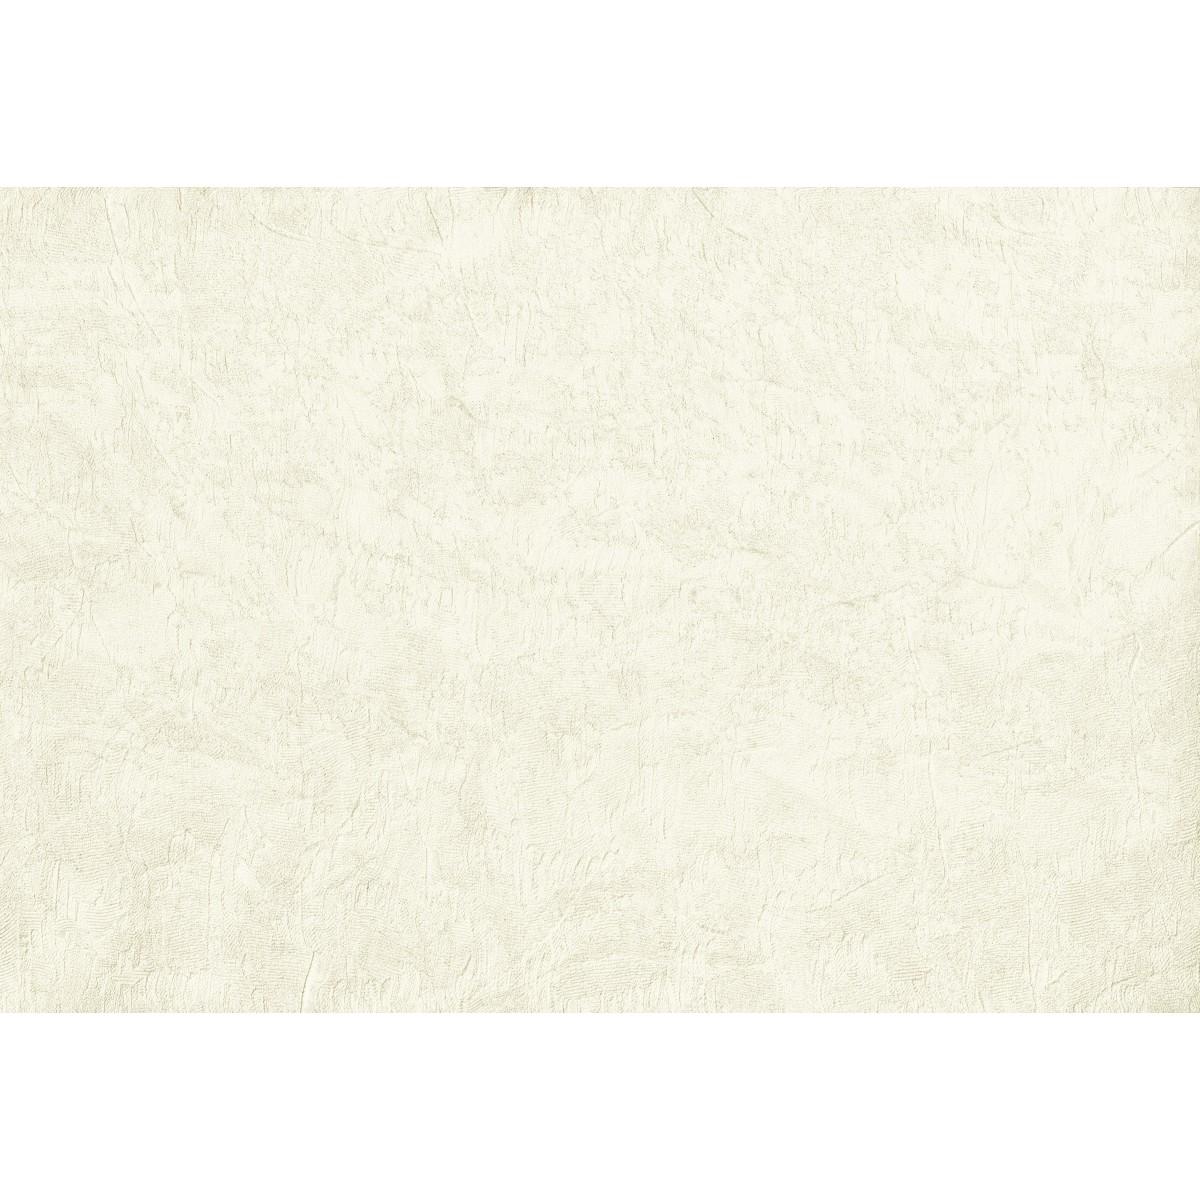 Обои флизелиновые Prima Italiana Bianca белые 1.06 м 20474